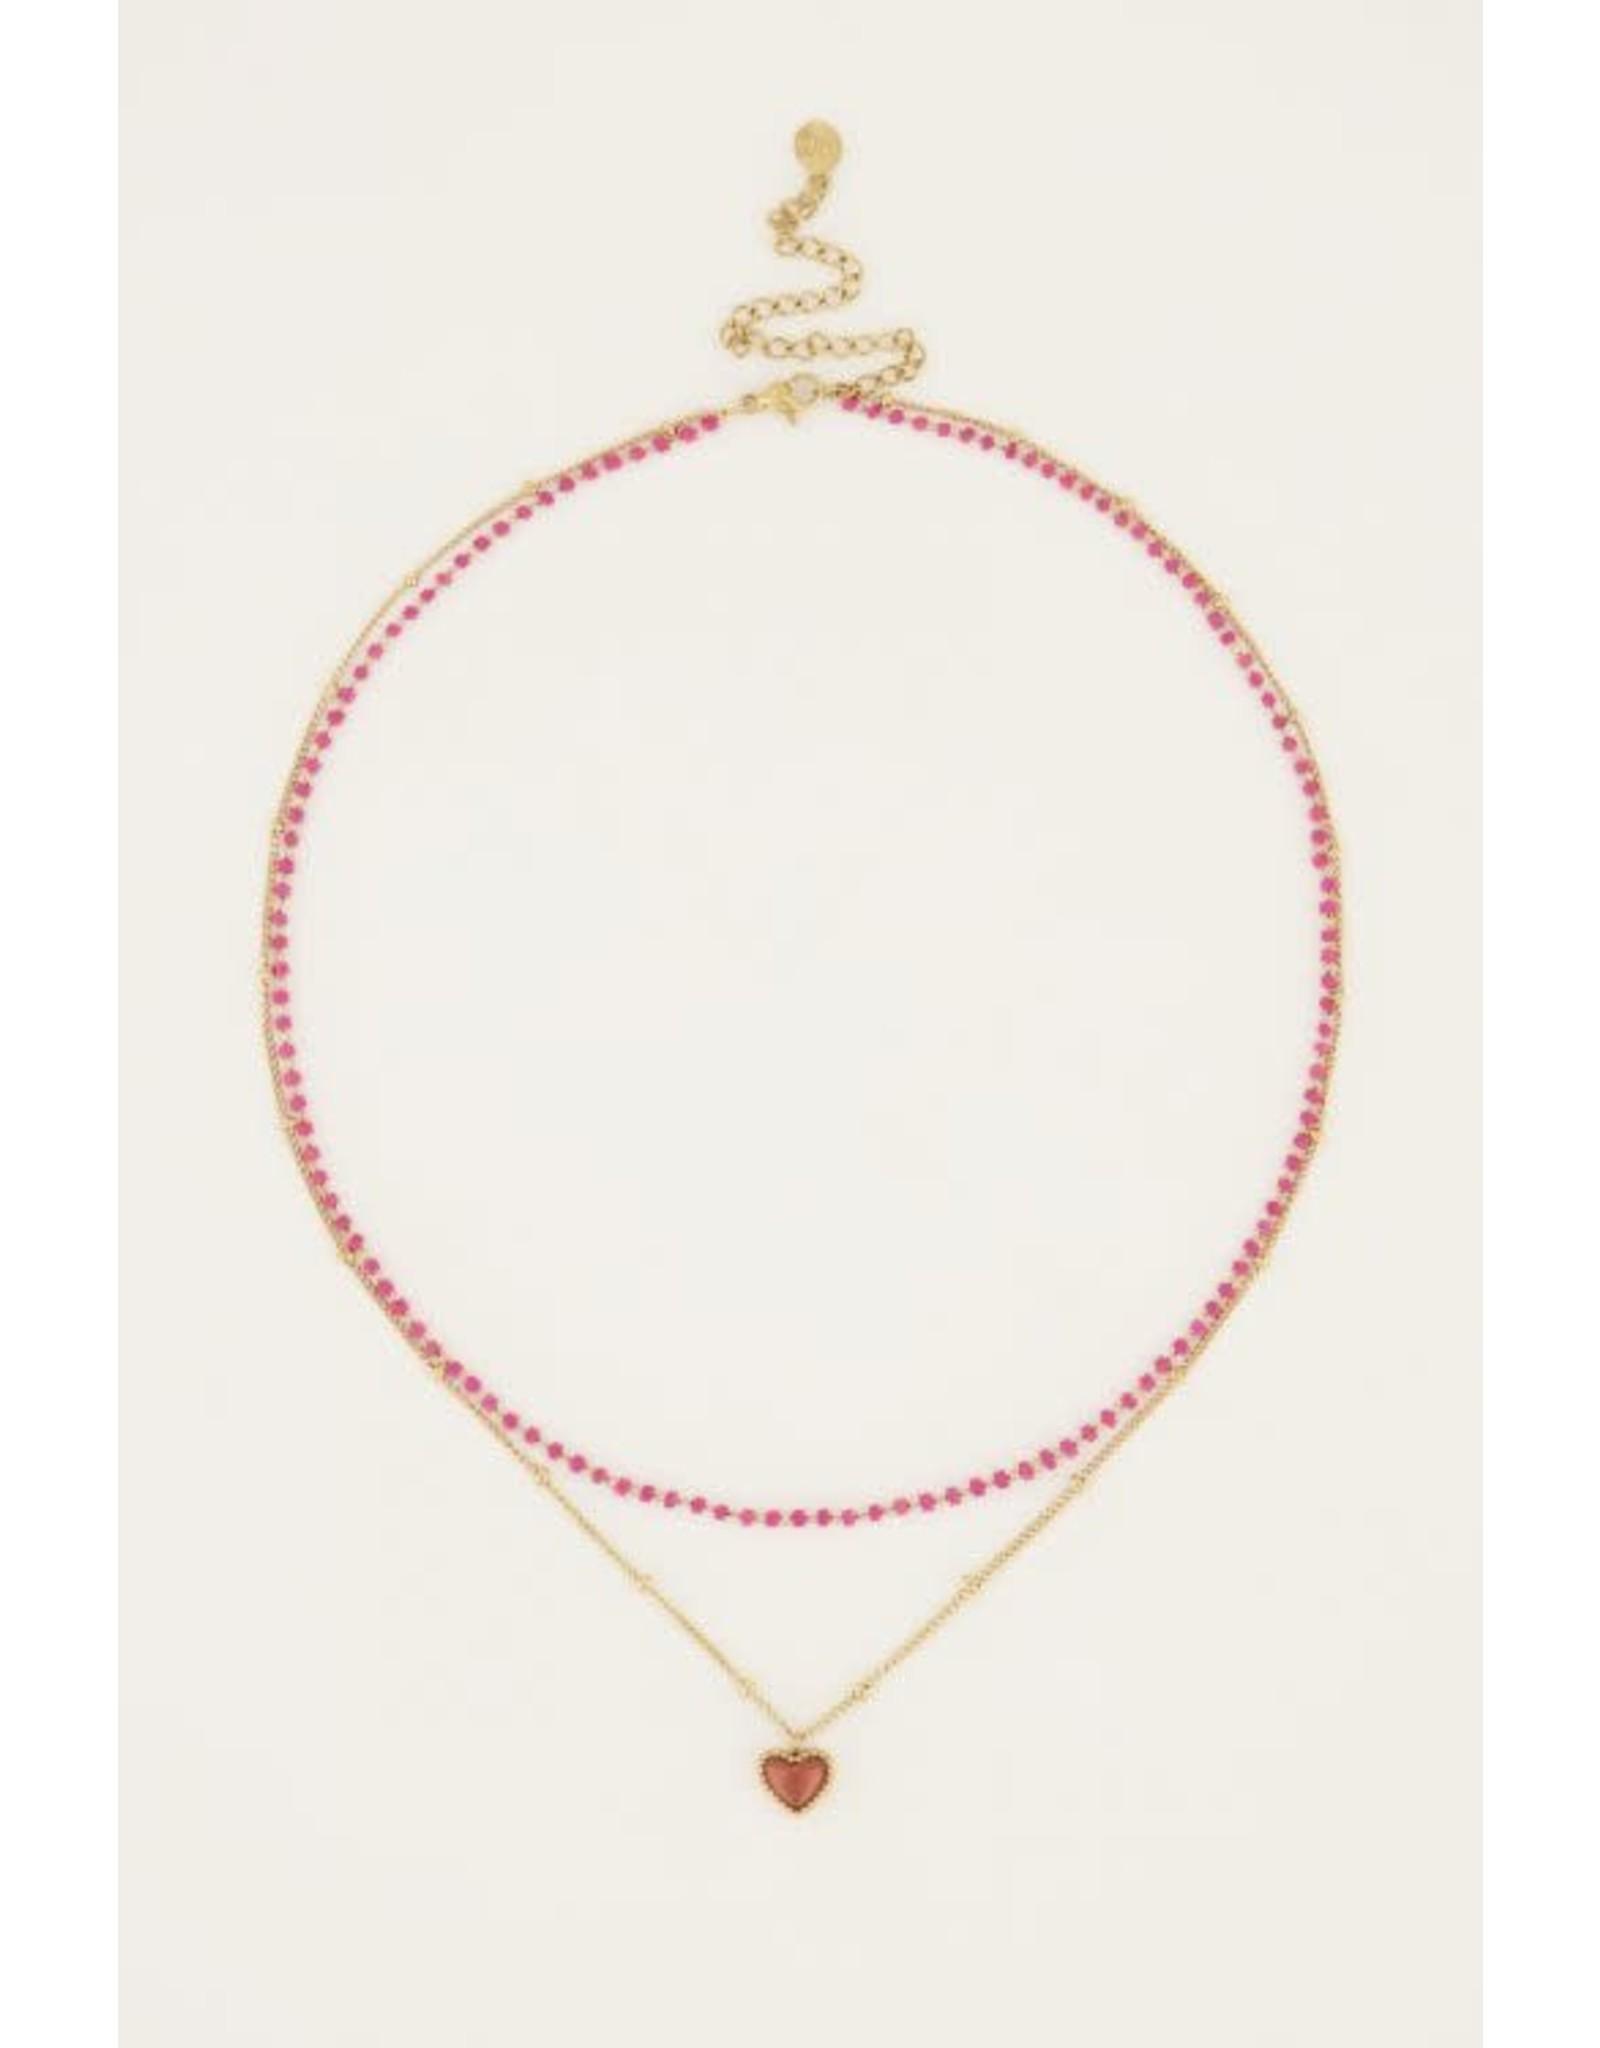 My Jewellery My Jewellery fuchsia dubbele kralenketting met hartje